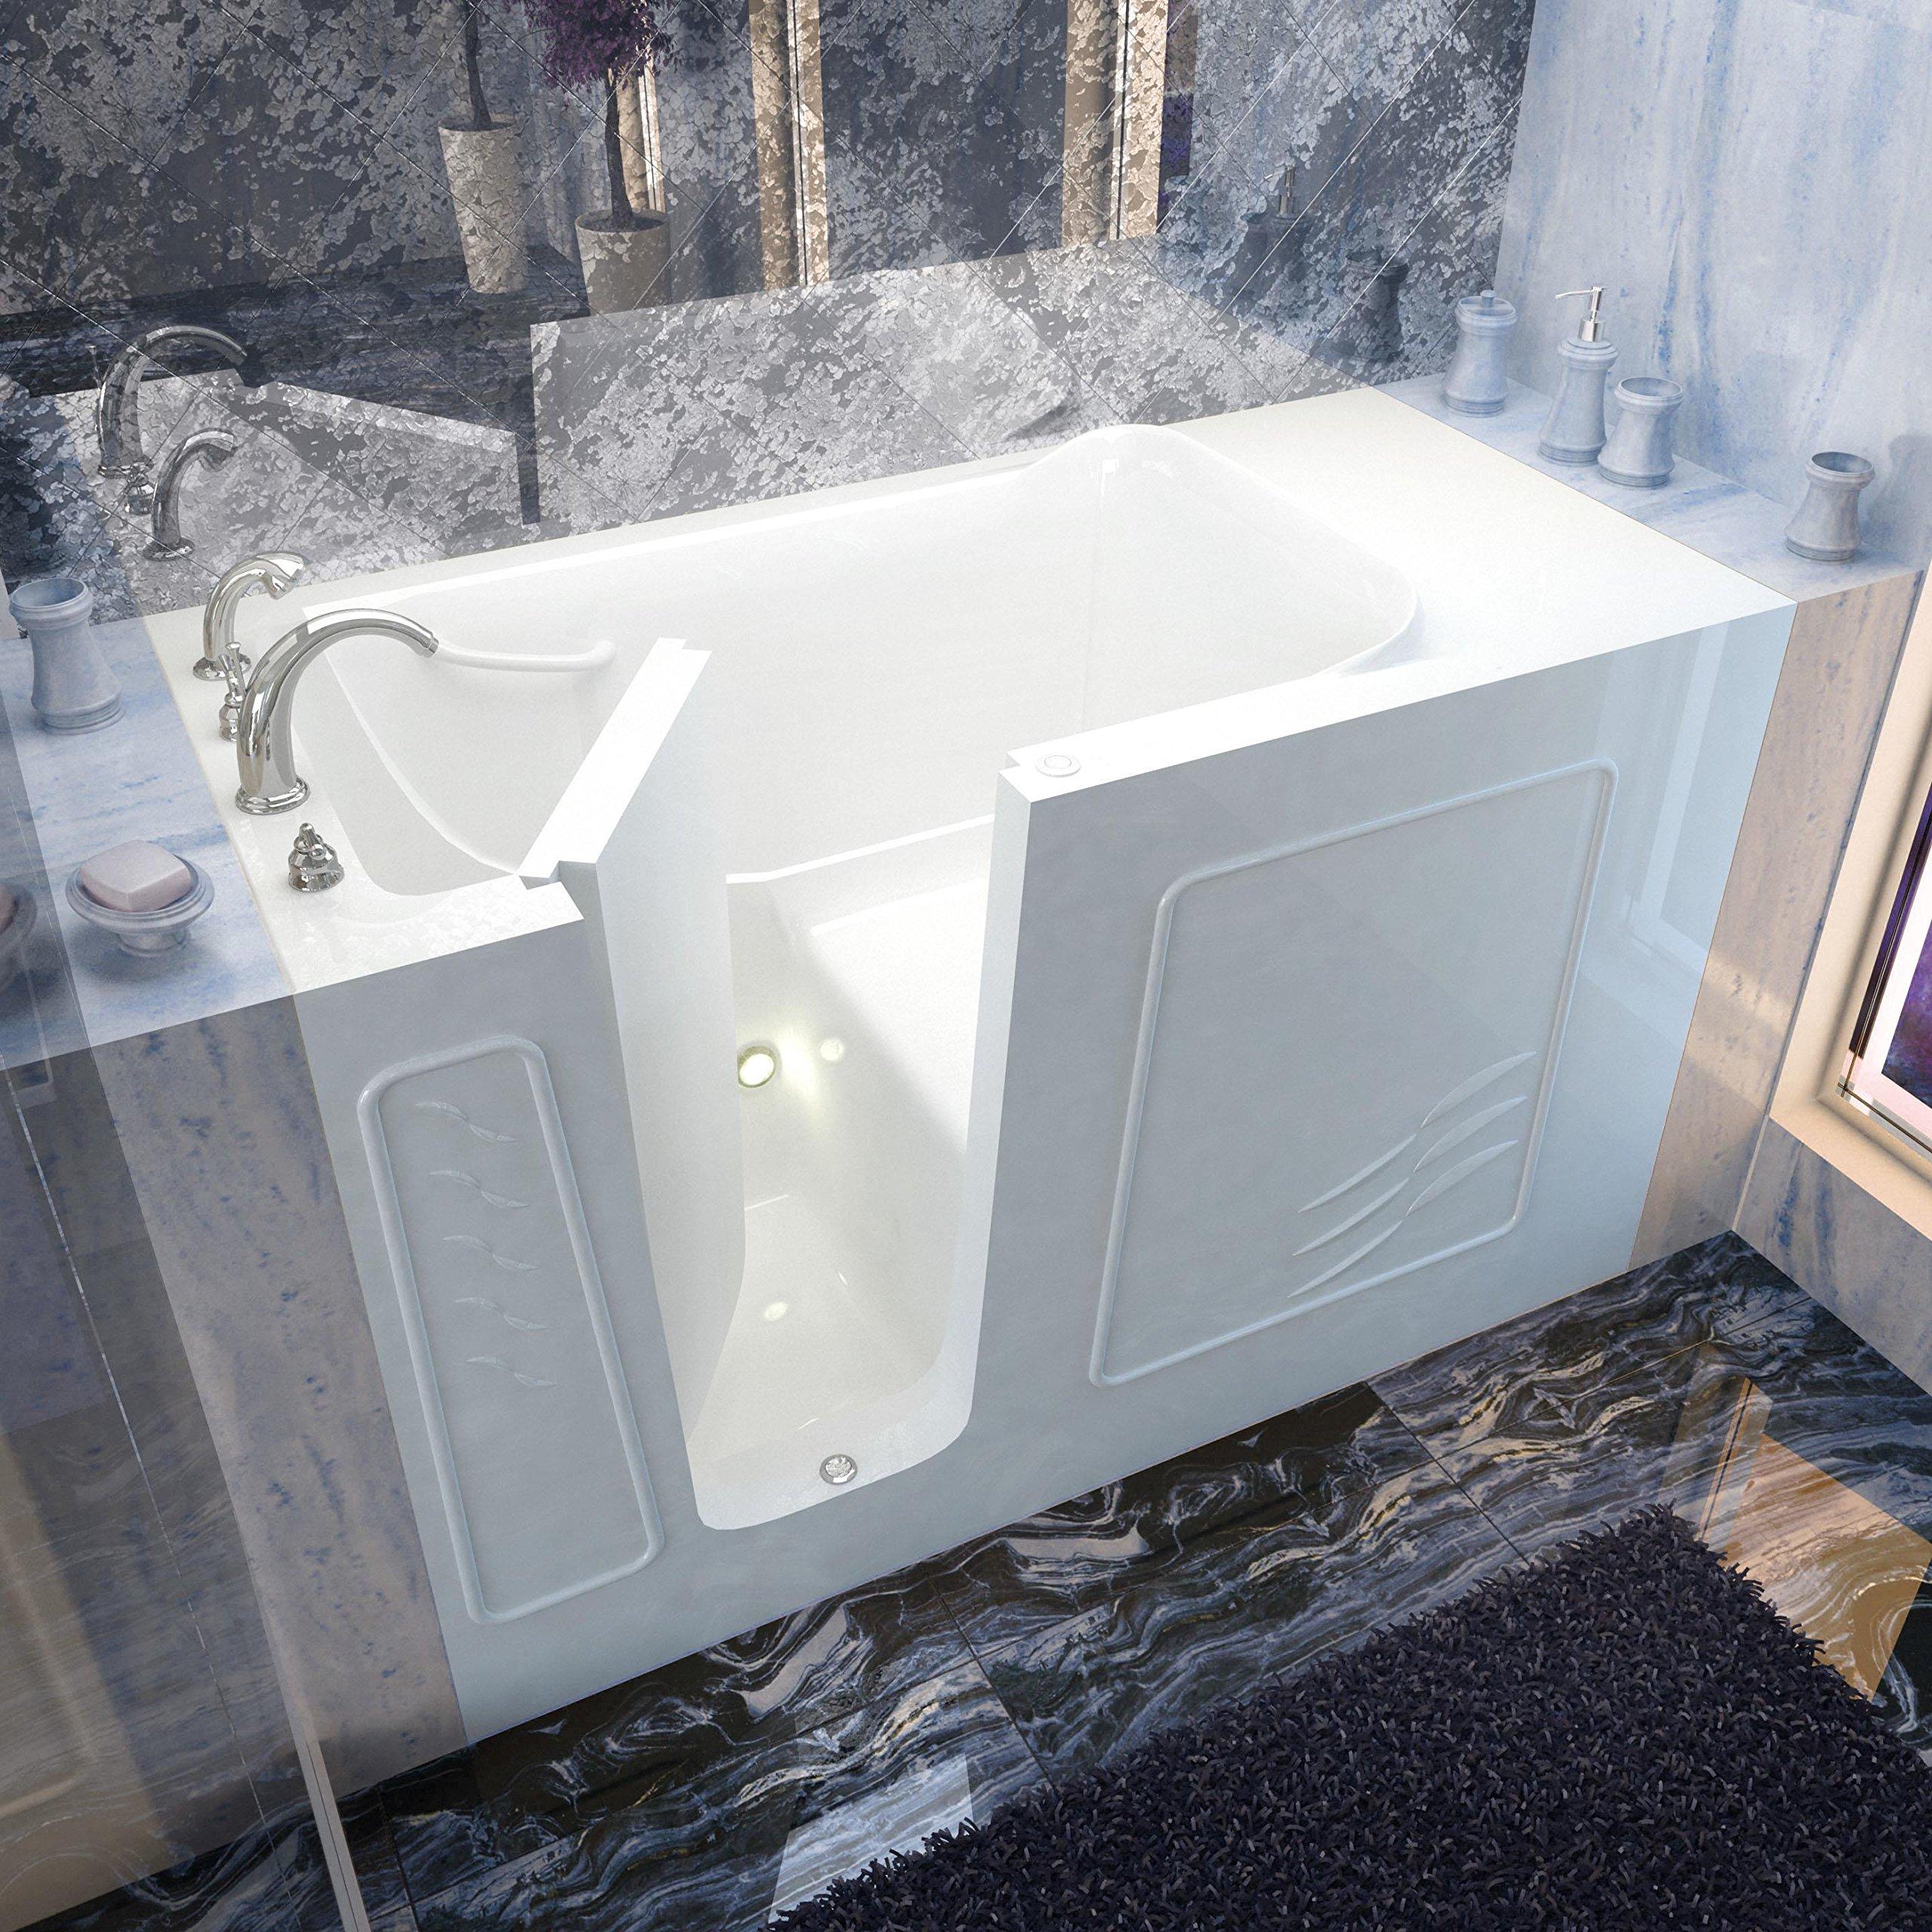 Spa World Venzi Vz3060wilws Rectangular Soaking Walk-In Bathtub, 30x60, Left Drain, White